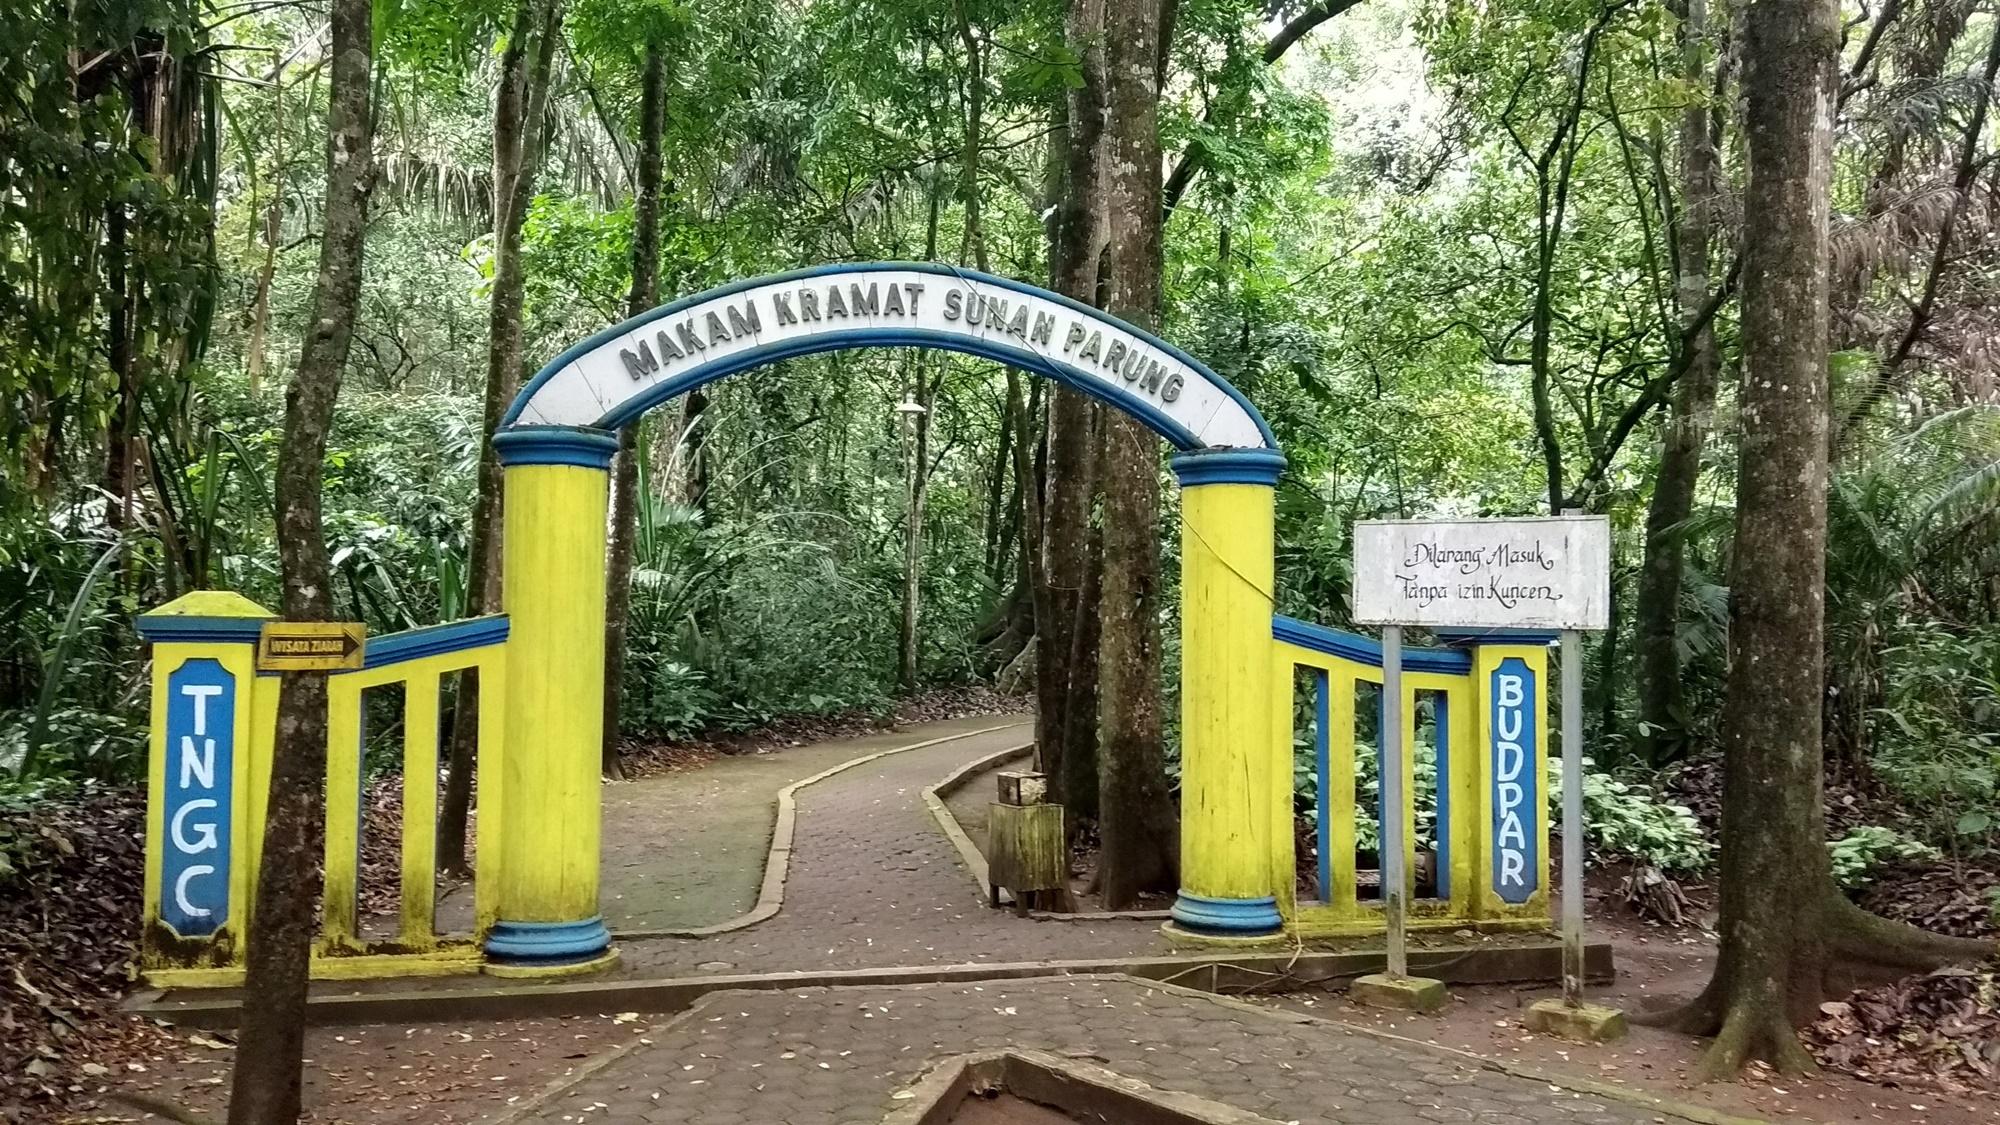 Area makam Sunan Parung